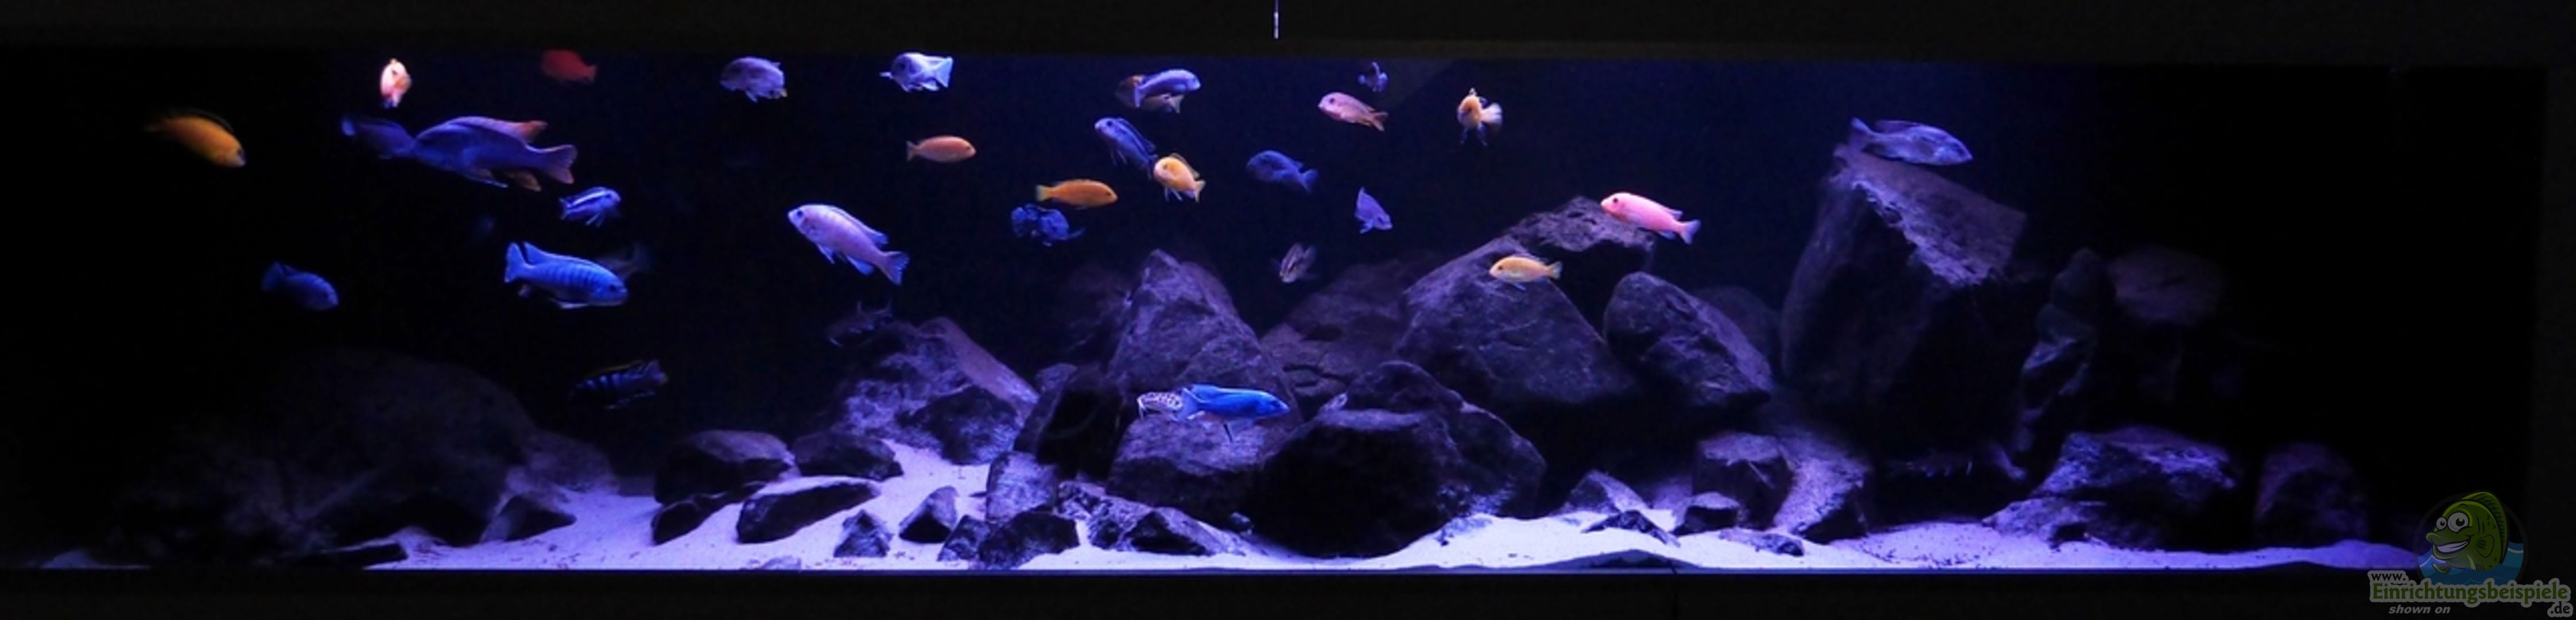 aquarium von cariba 23663 malawibiotop liter. Black Bedroom Furniture Sets. Home Design Ideas